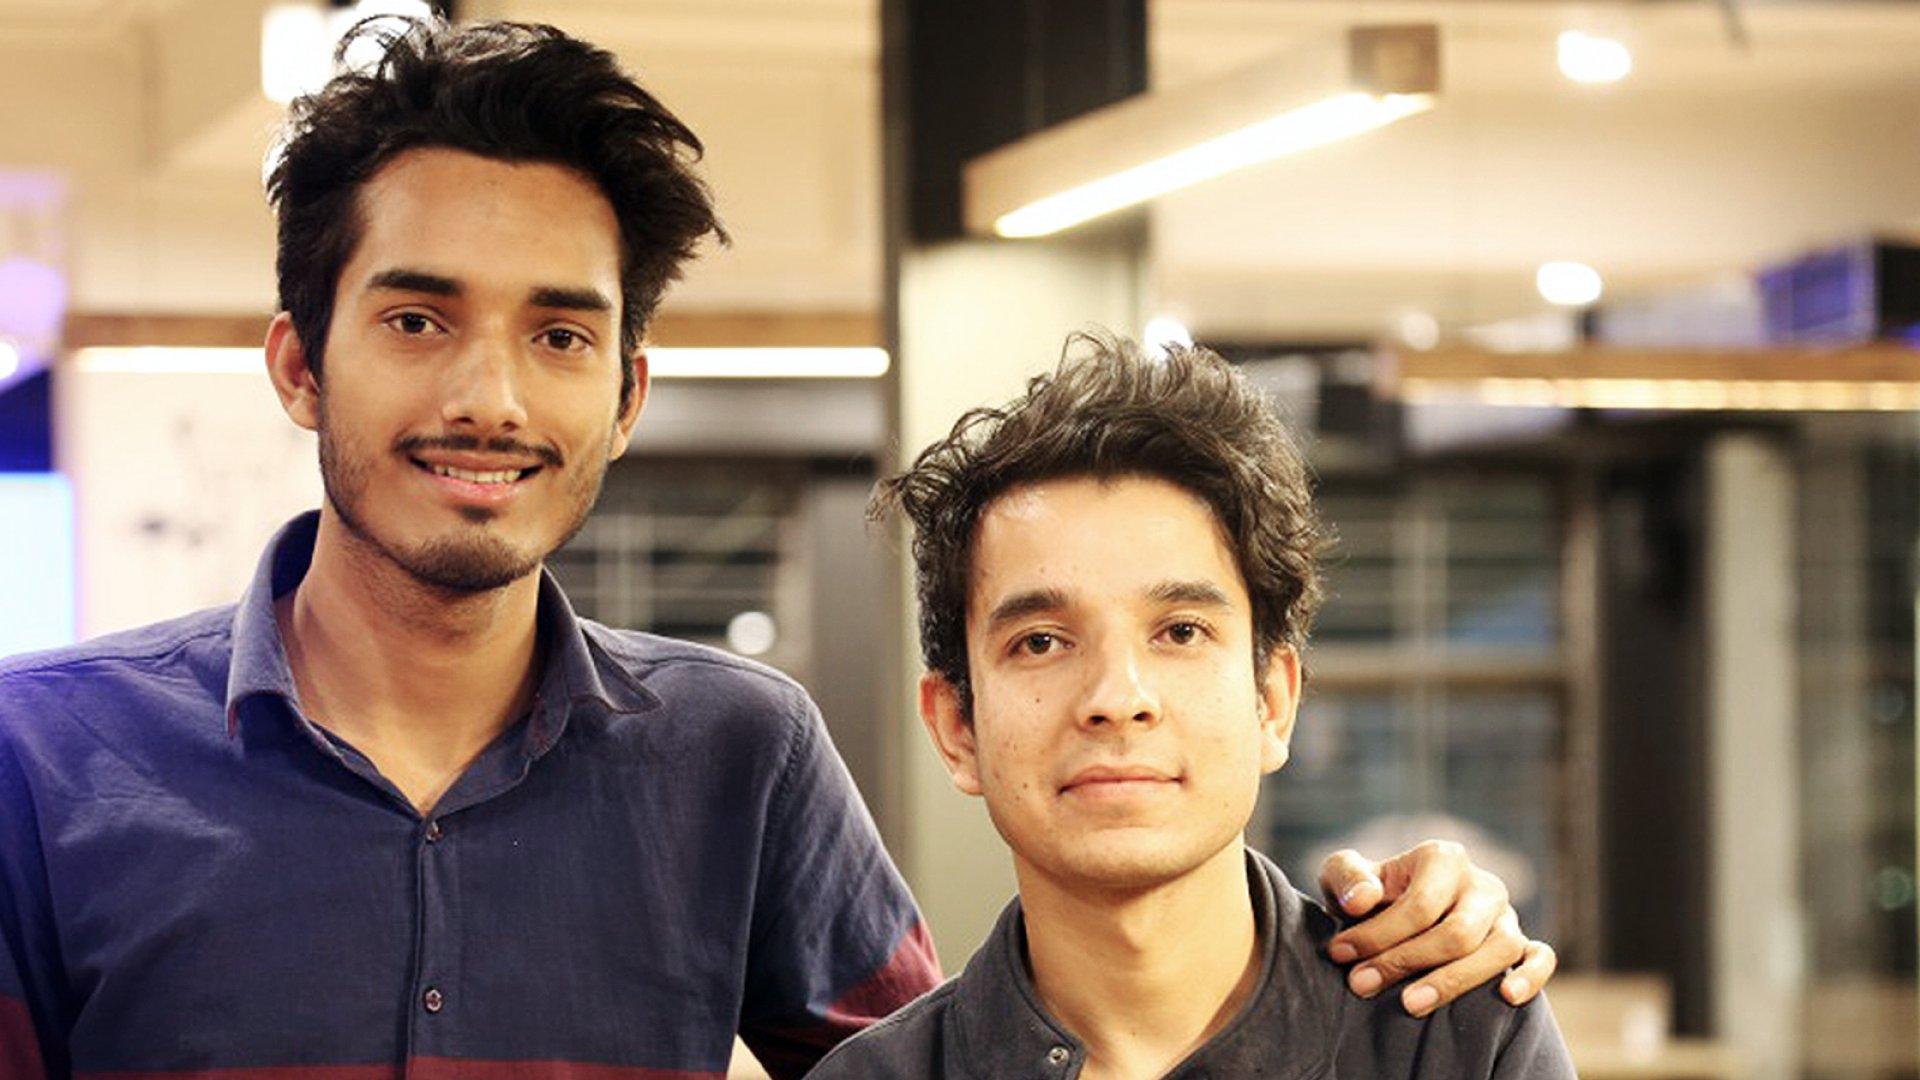 Bameslog founders Bhupinder Nayyar, left, and Ajay Thakur.